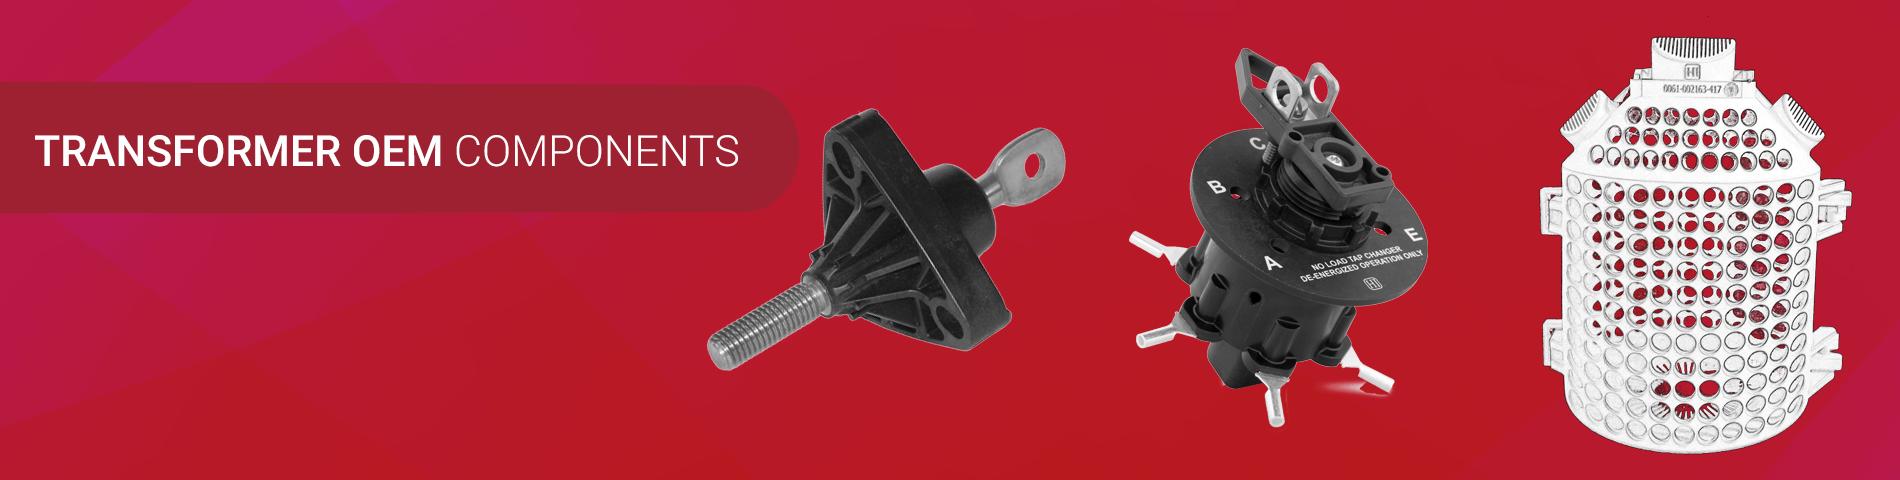 Transformer OEM Components